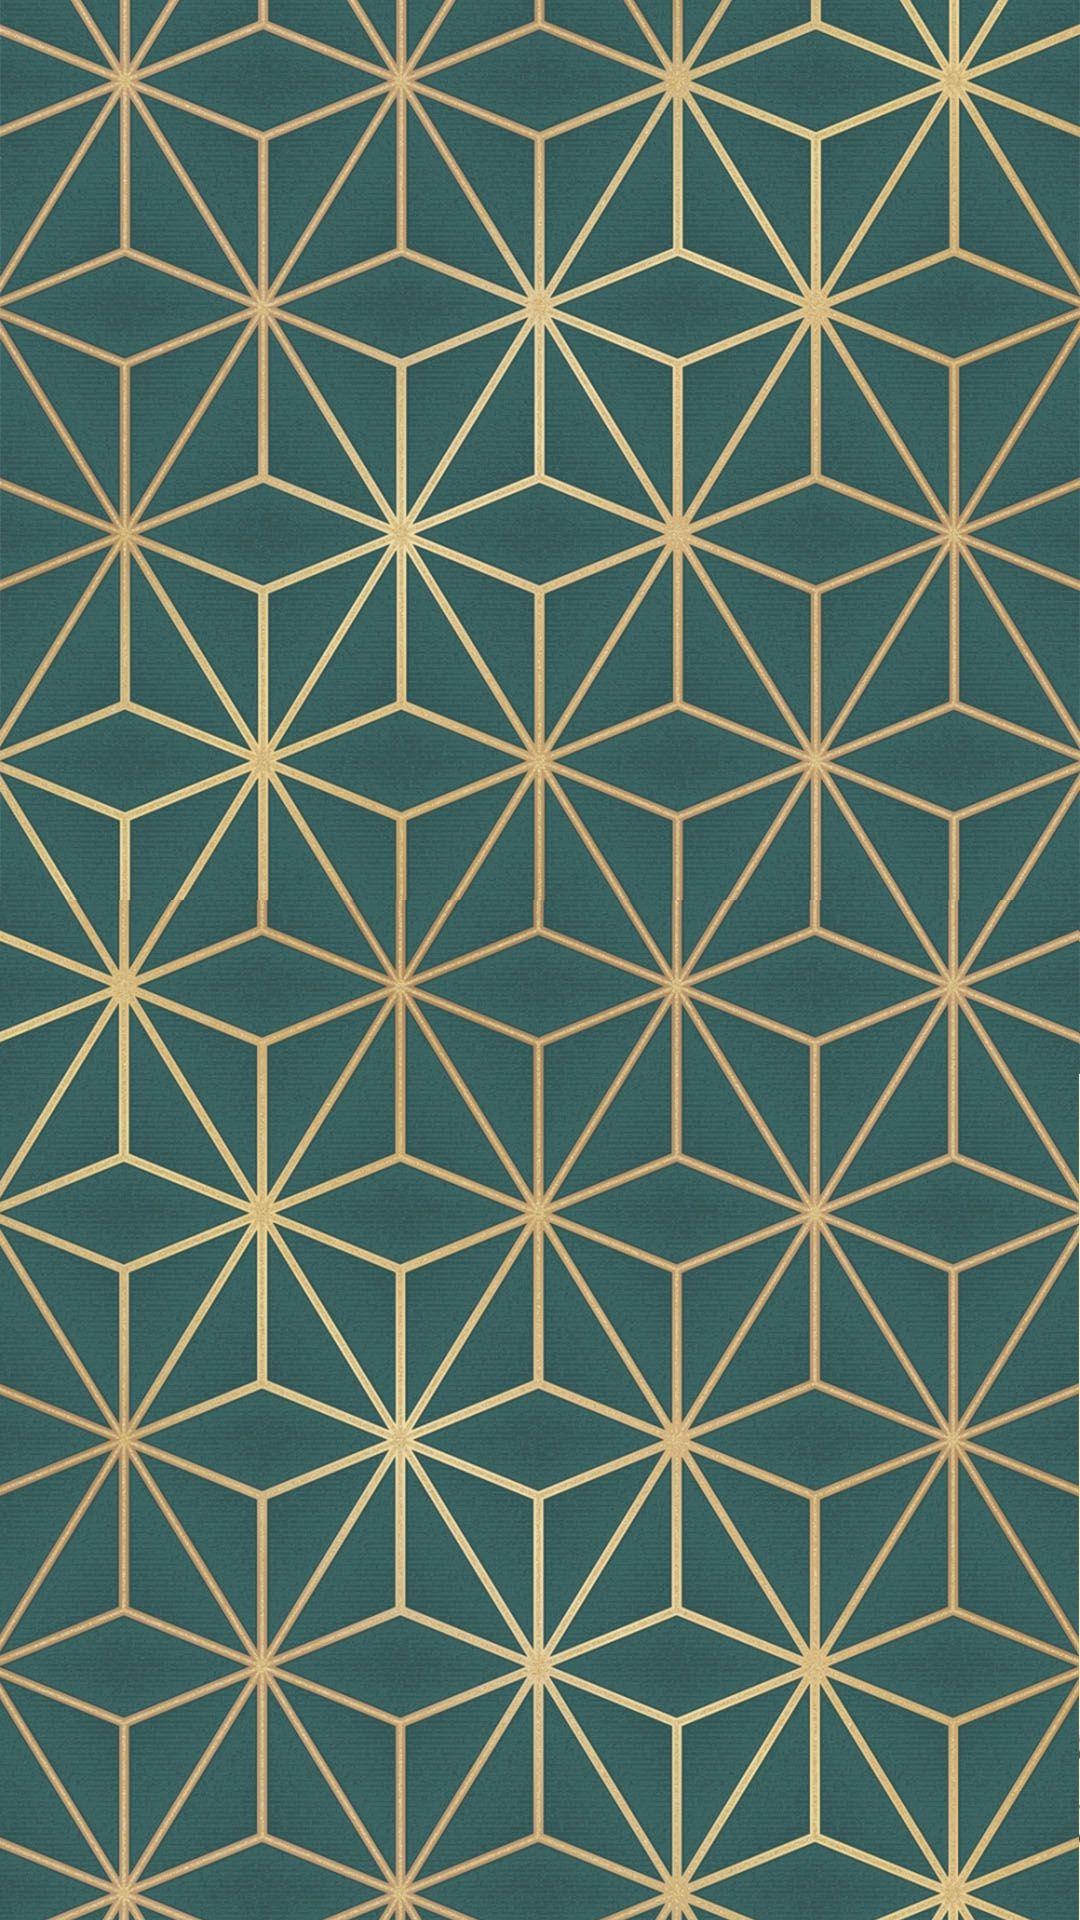 Astral Metallic Wallpaper Emerald Green, Gold Metallic